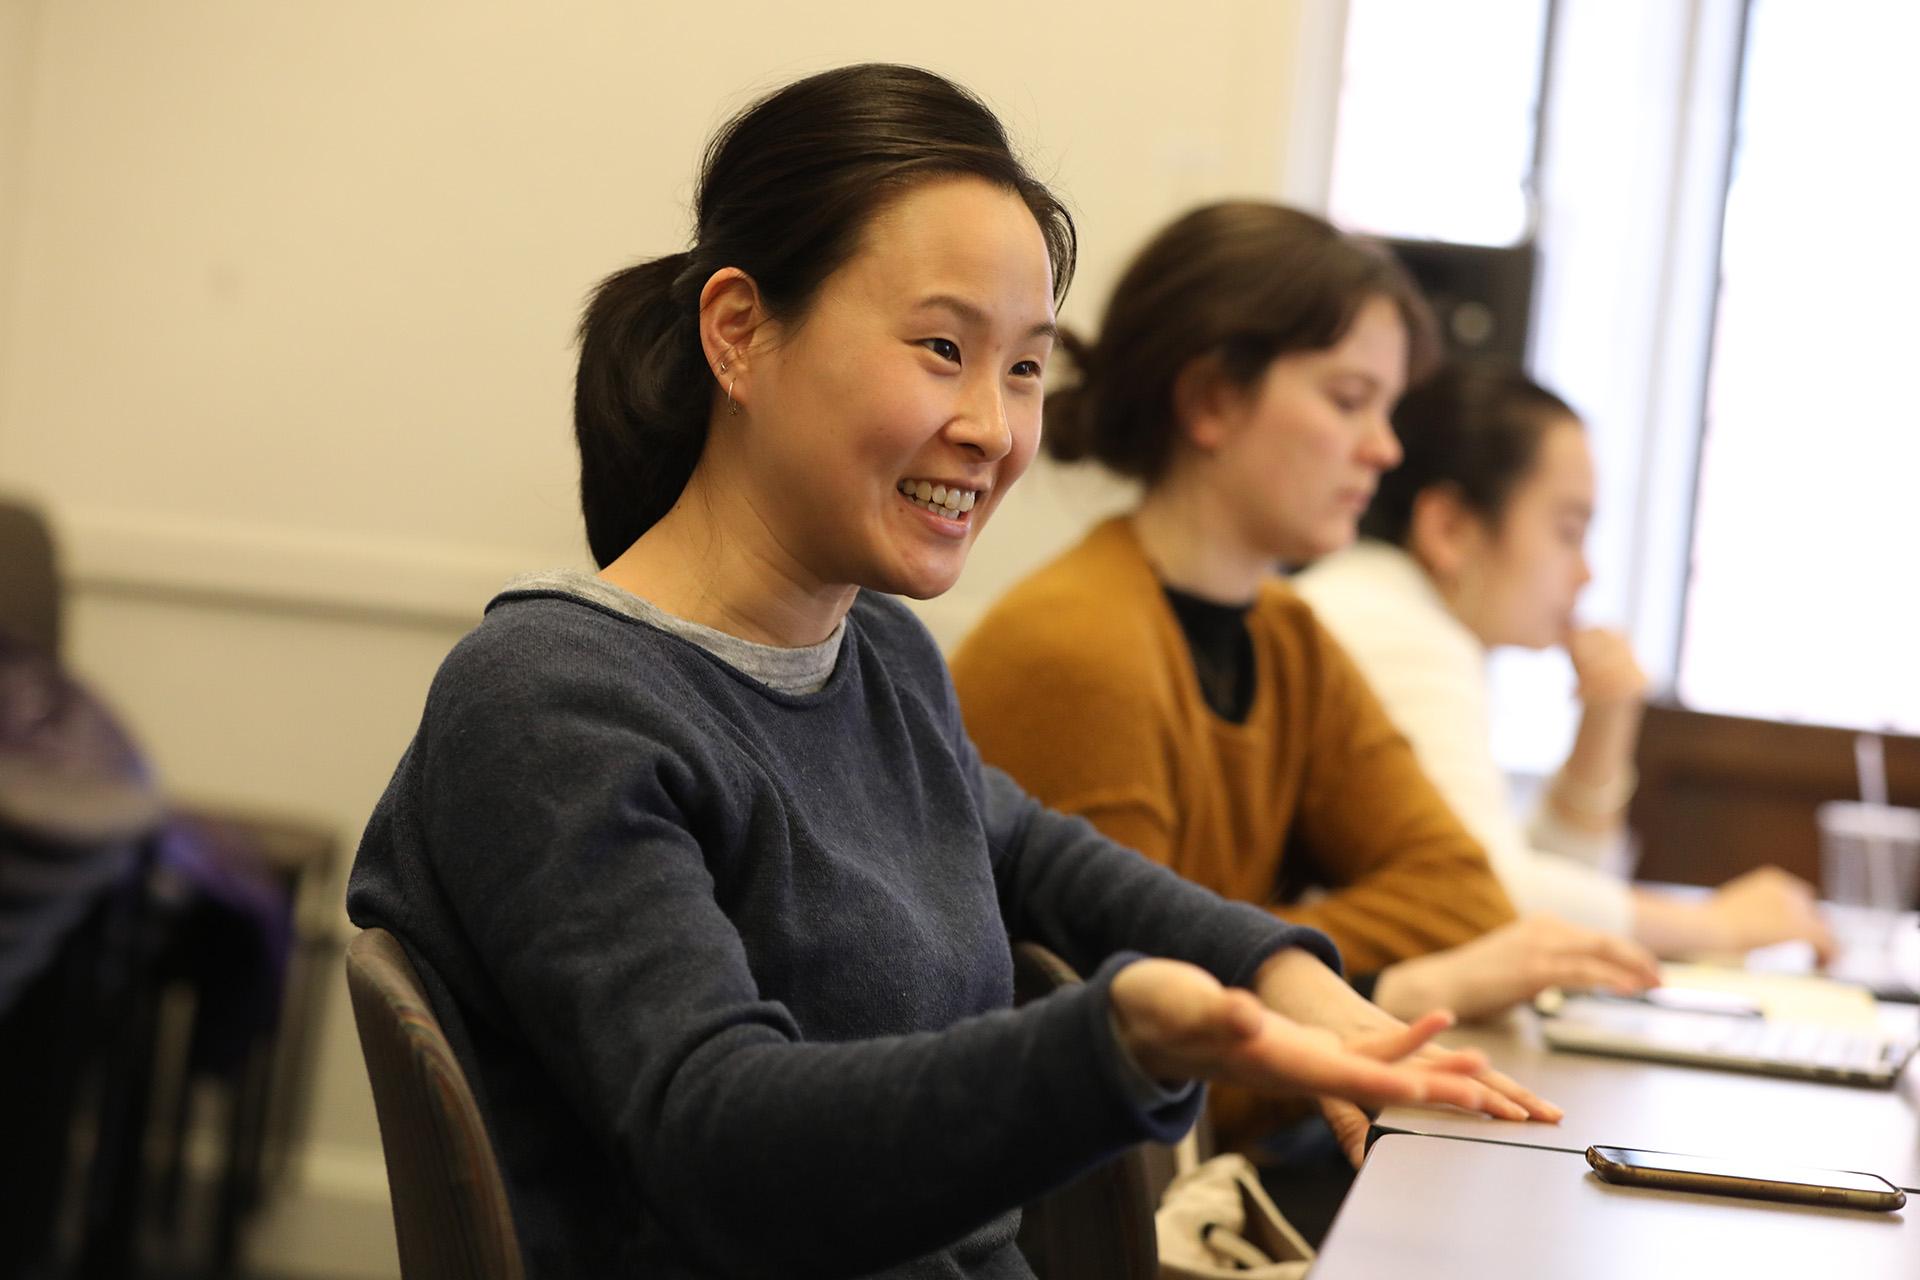 Alicia Austin ('20) in design class, Yale School of Drama, 2018. Photo by Joan Marcus.